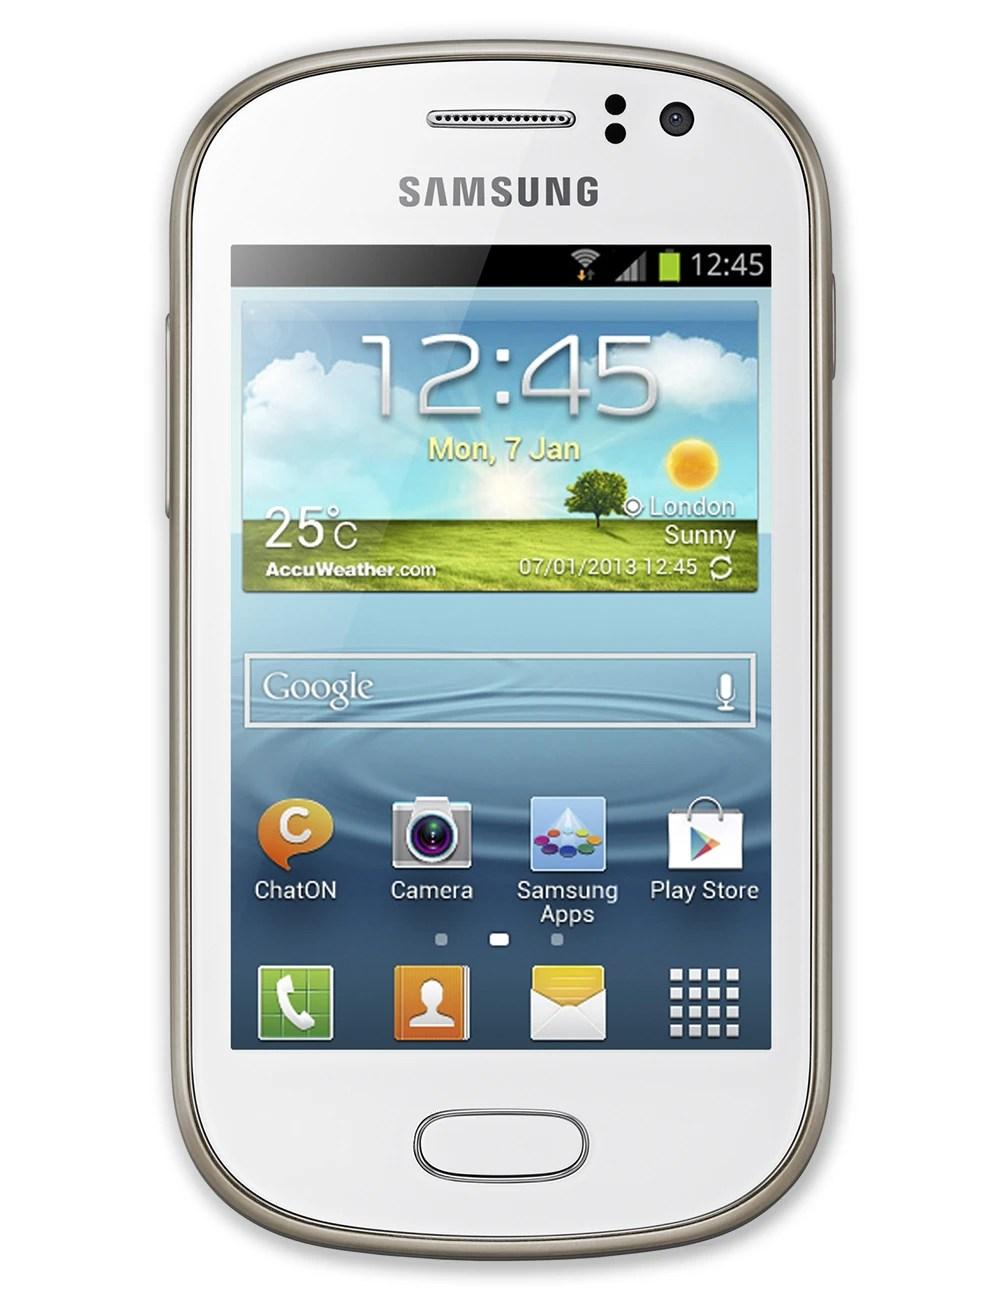 https://i2.wp.com/i-cdn.phonearena.com/images/phones/39711-xlarge/Samsung-Galaxy-Fame.jpg